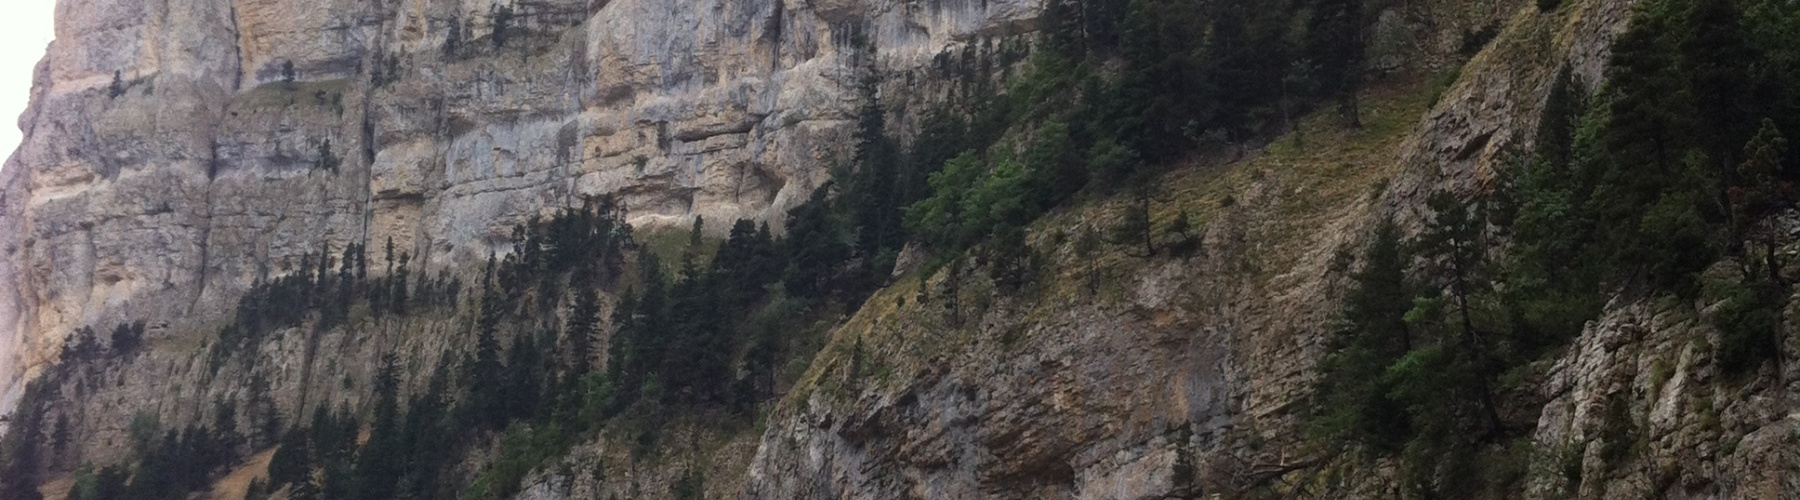 Trek Salam Montagne